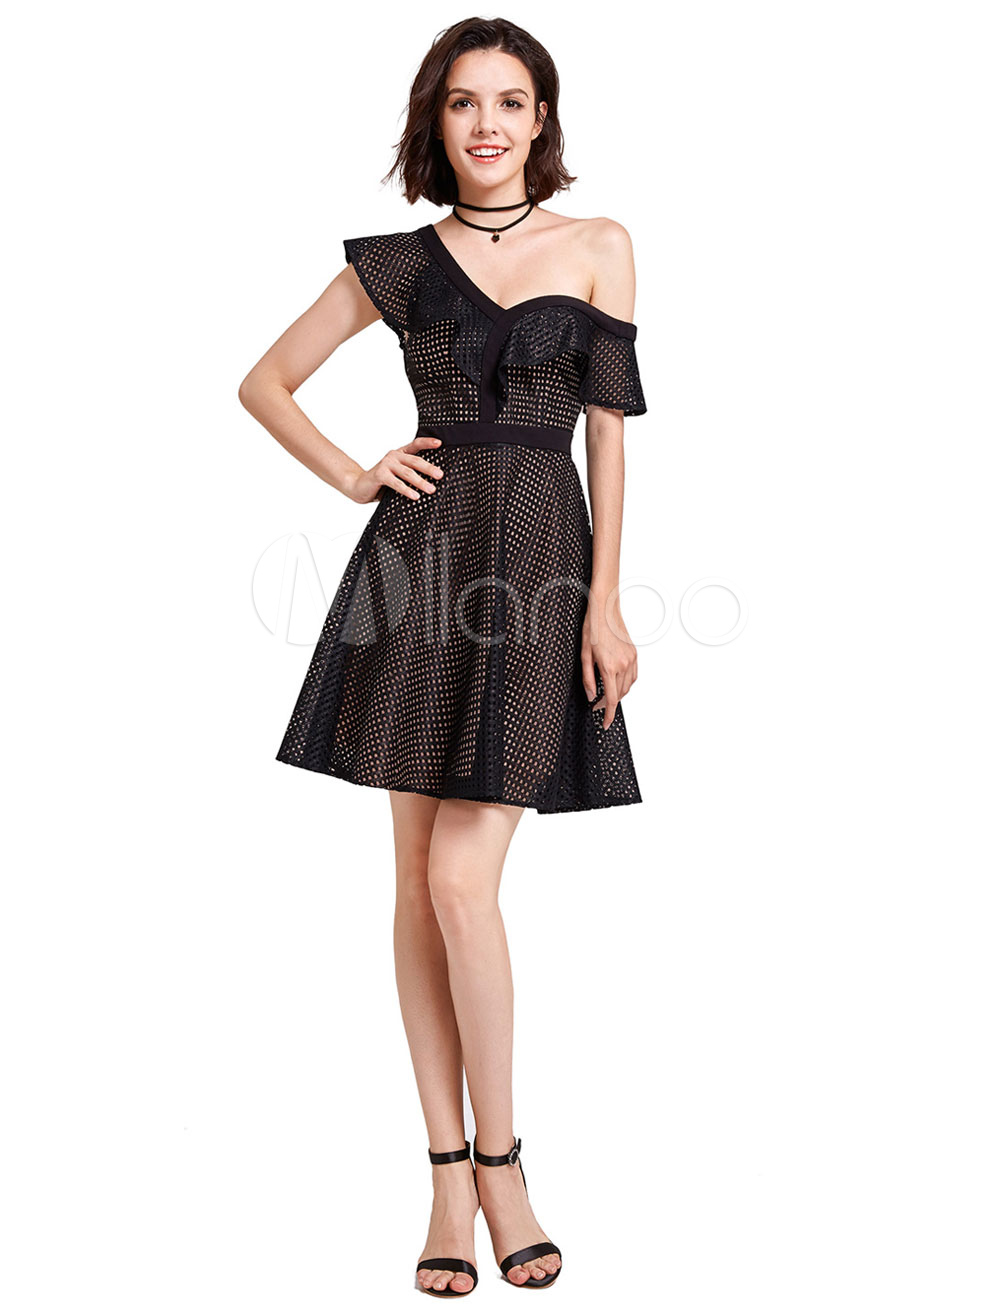 Black Cocktail Dress One Shoulder Short Sleeve Cut Out Backless Party Dresses A Line Mini Homecoming Dresses (Wedding Cocktail Dresses) photo